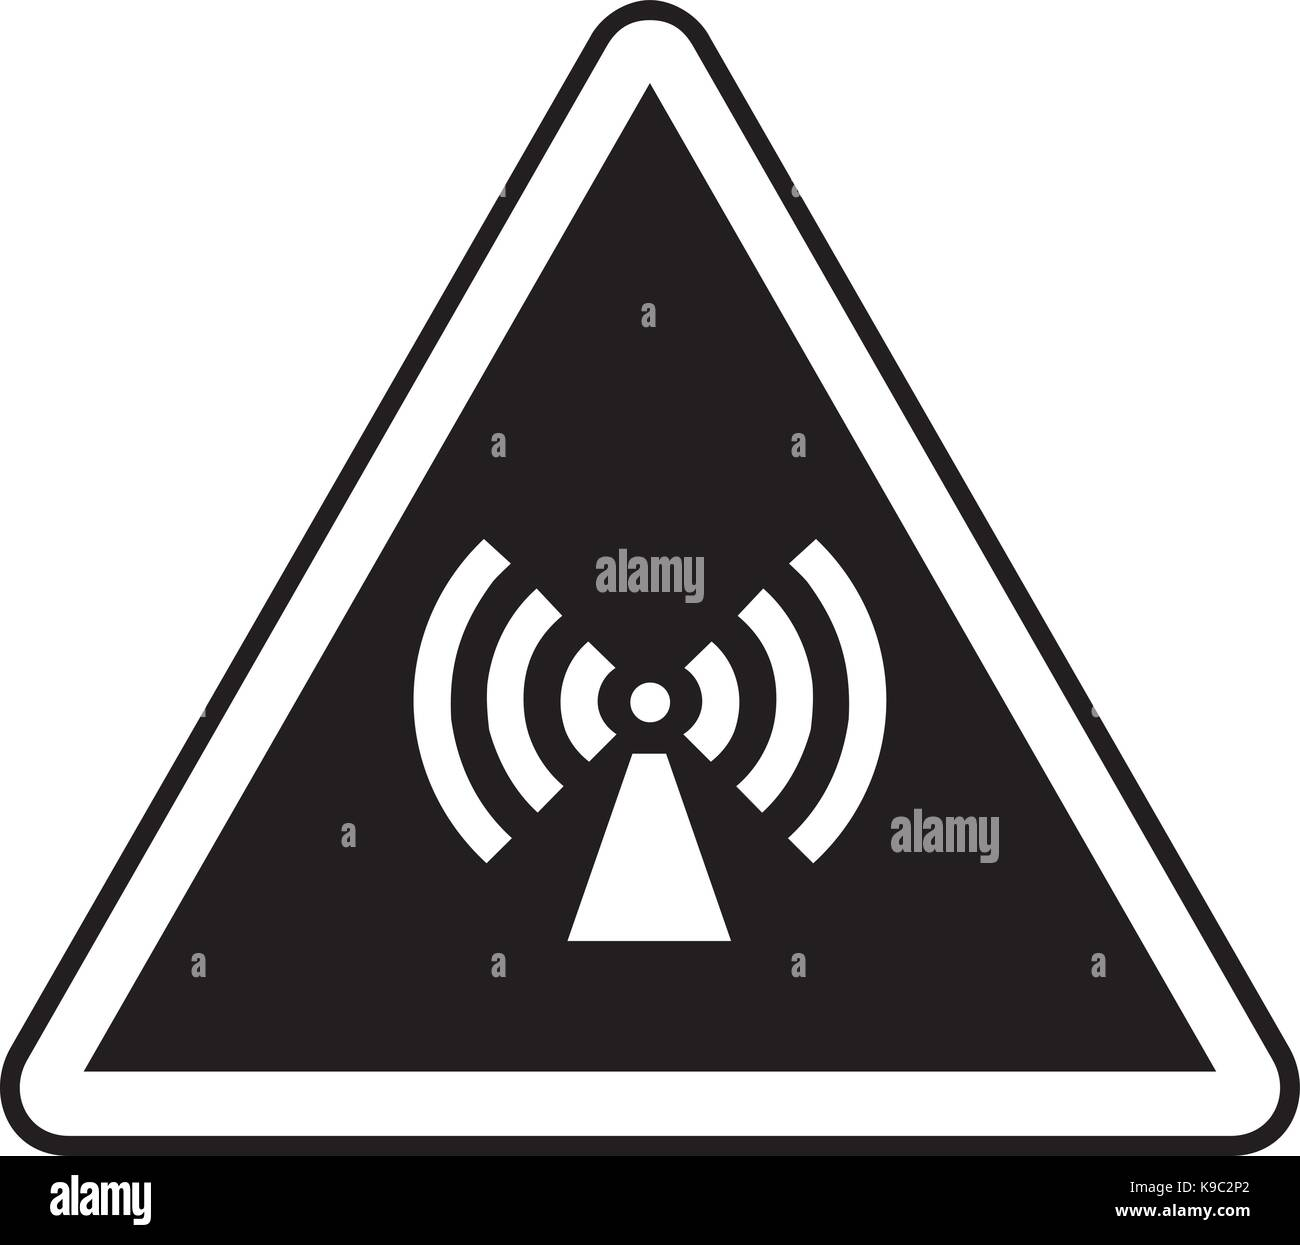 Non ionizing radiation warning sign - Stock Vector